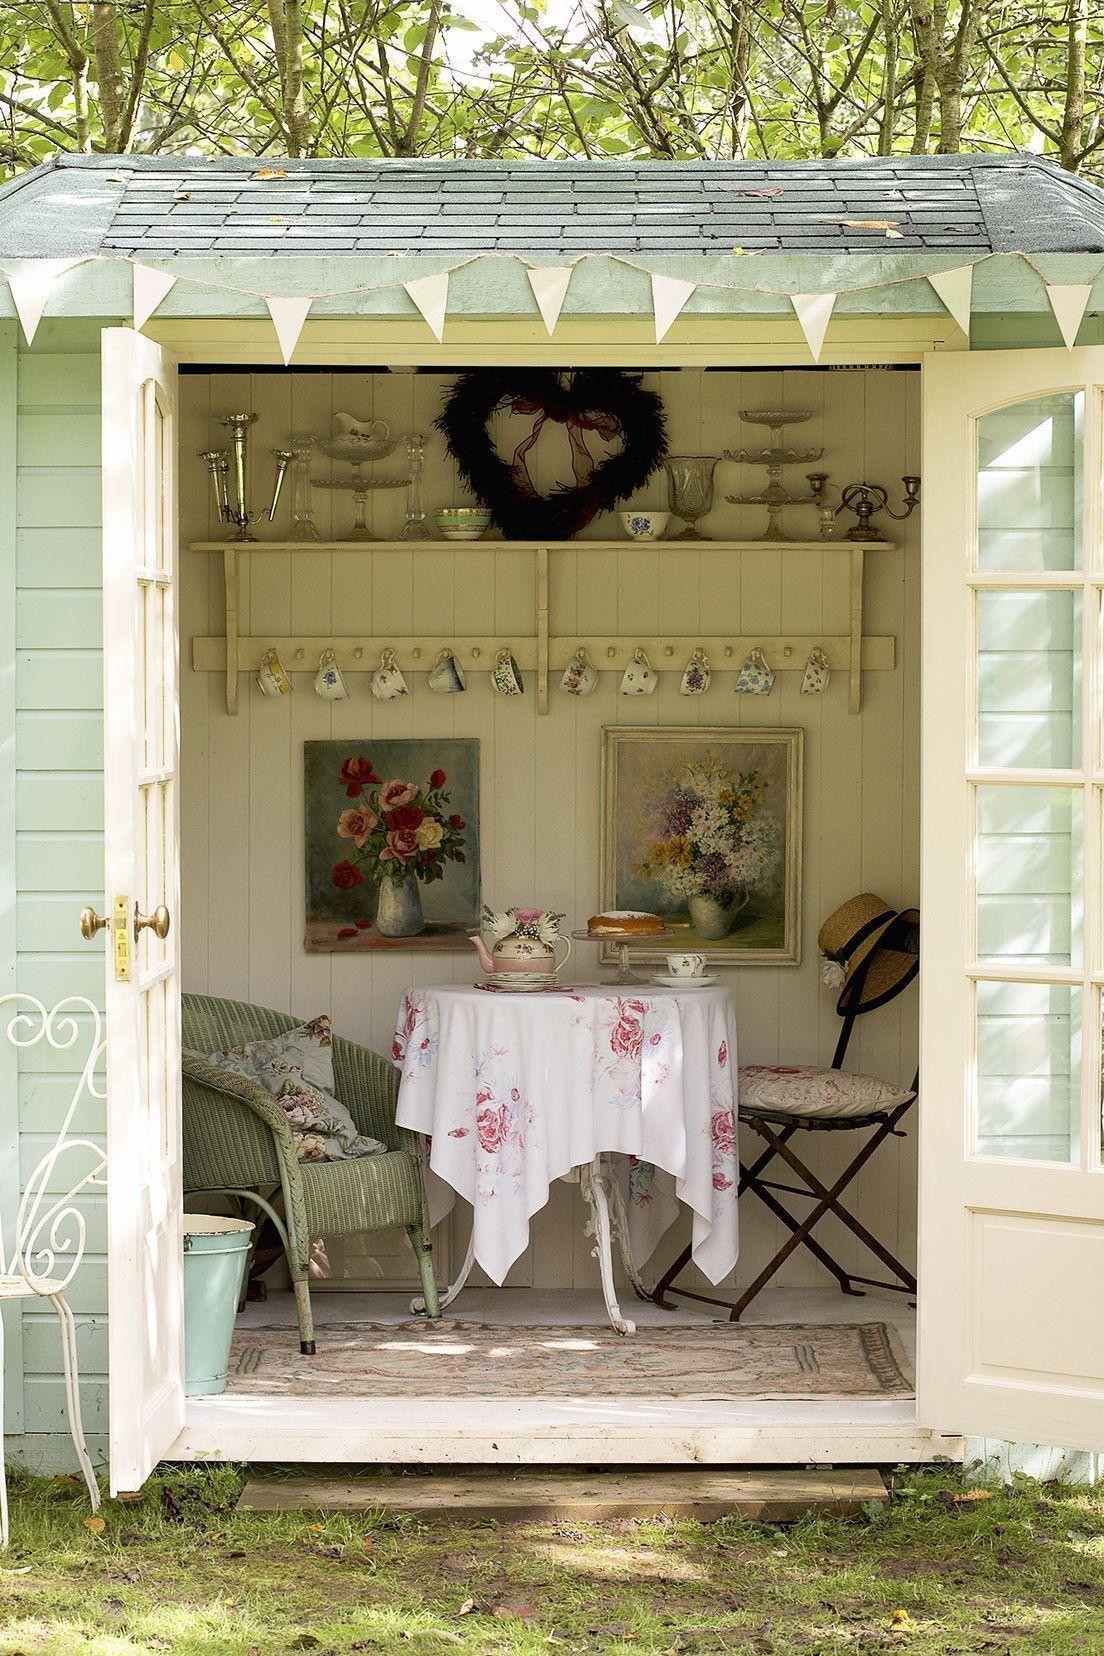 Granny pods #grannypods #granny pods backyard cottage ...